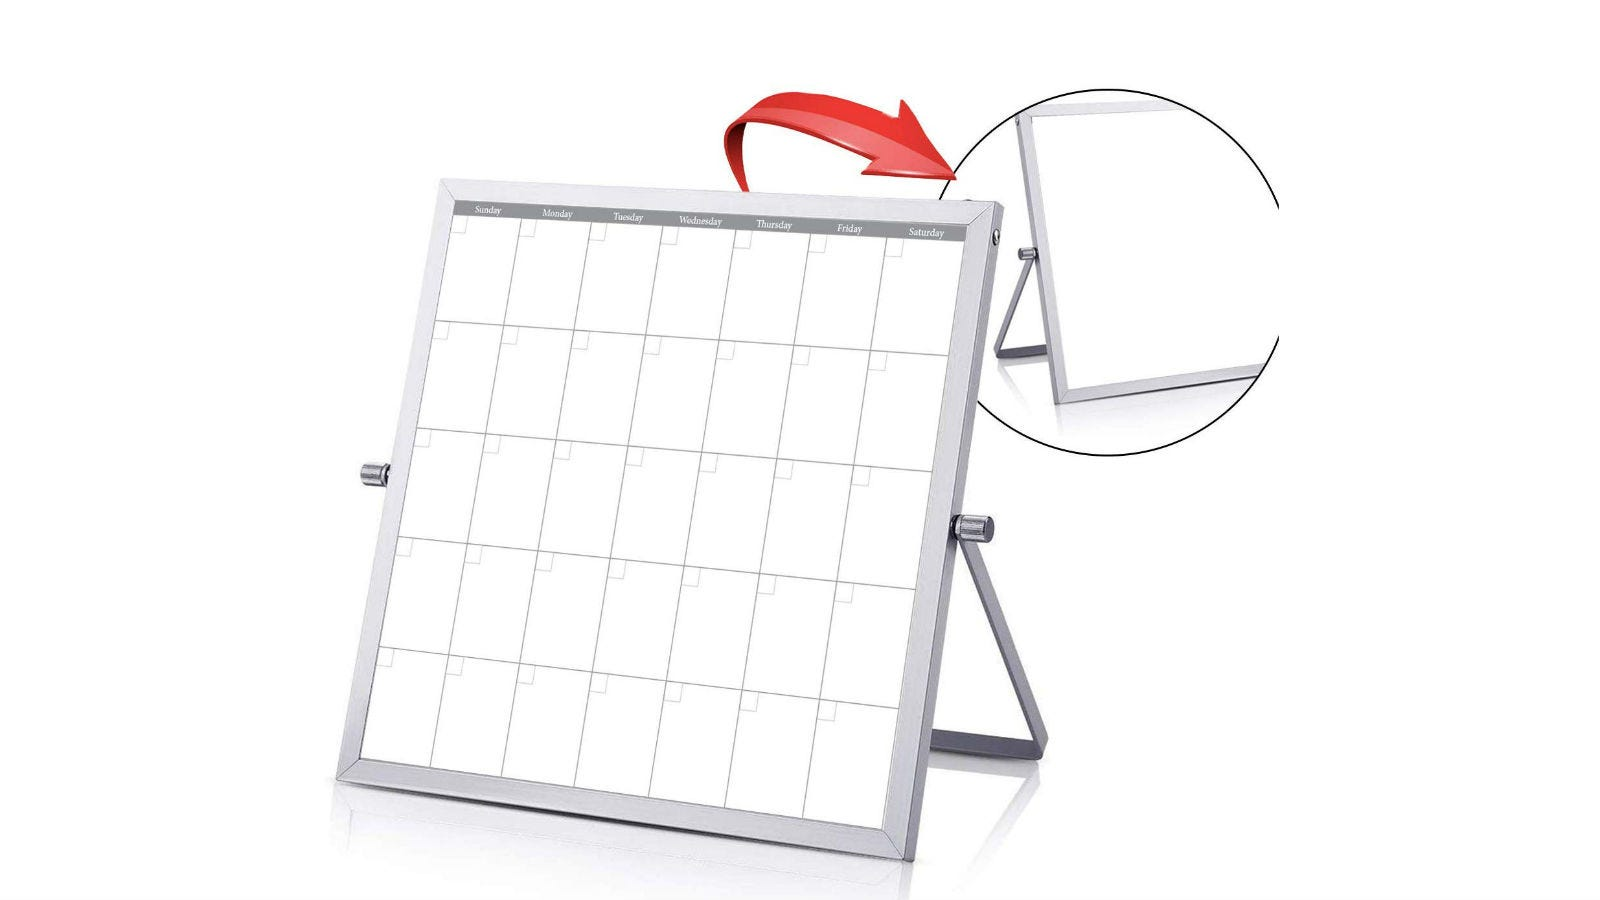 Phoenix Planner Small Dry Erase White Board Calendar